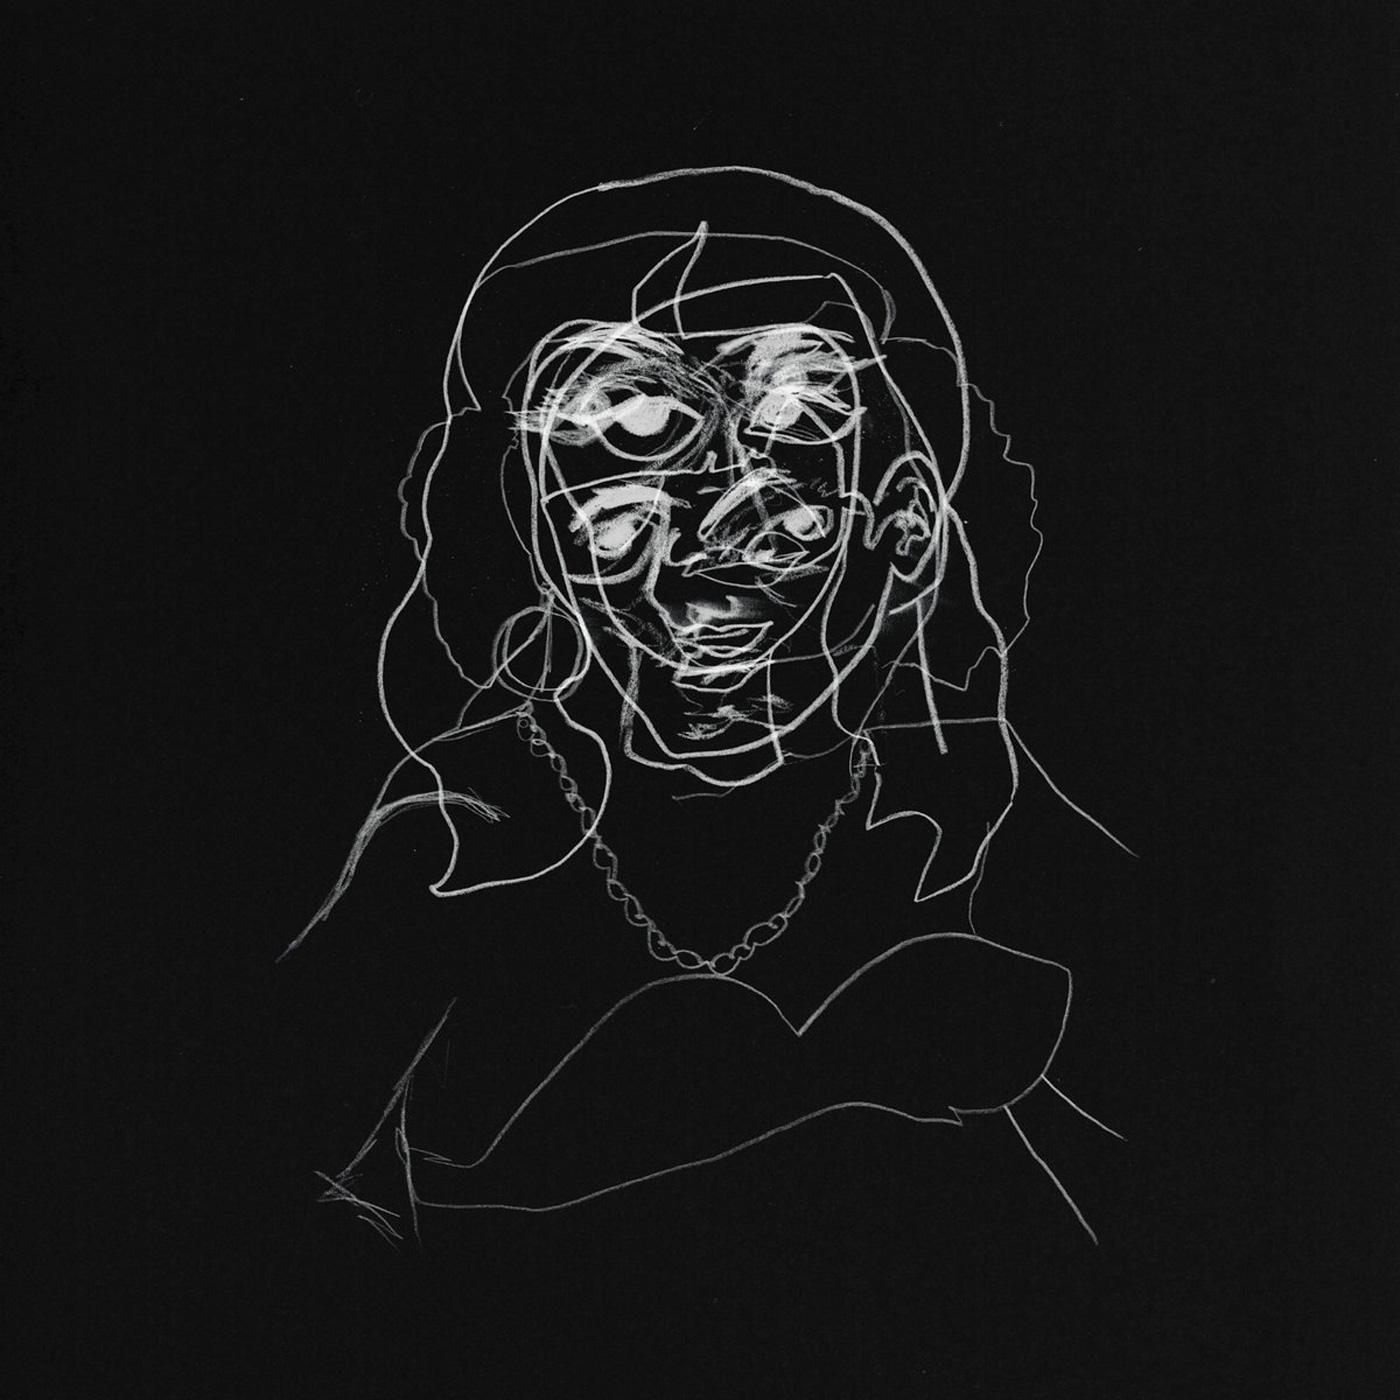 Ra Reviews Loke Rahbek City Of Women On Editions Mego Album Klara Brow Studio 02 Dark Lewis Too